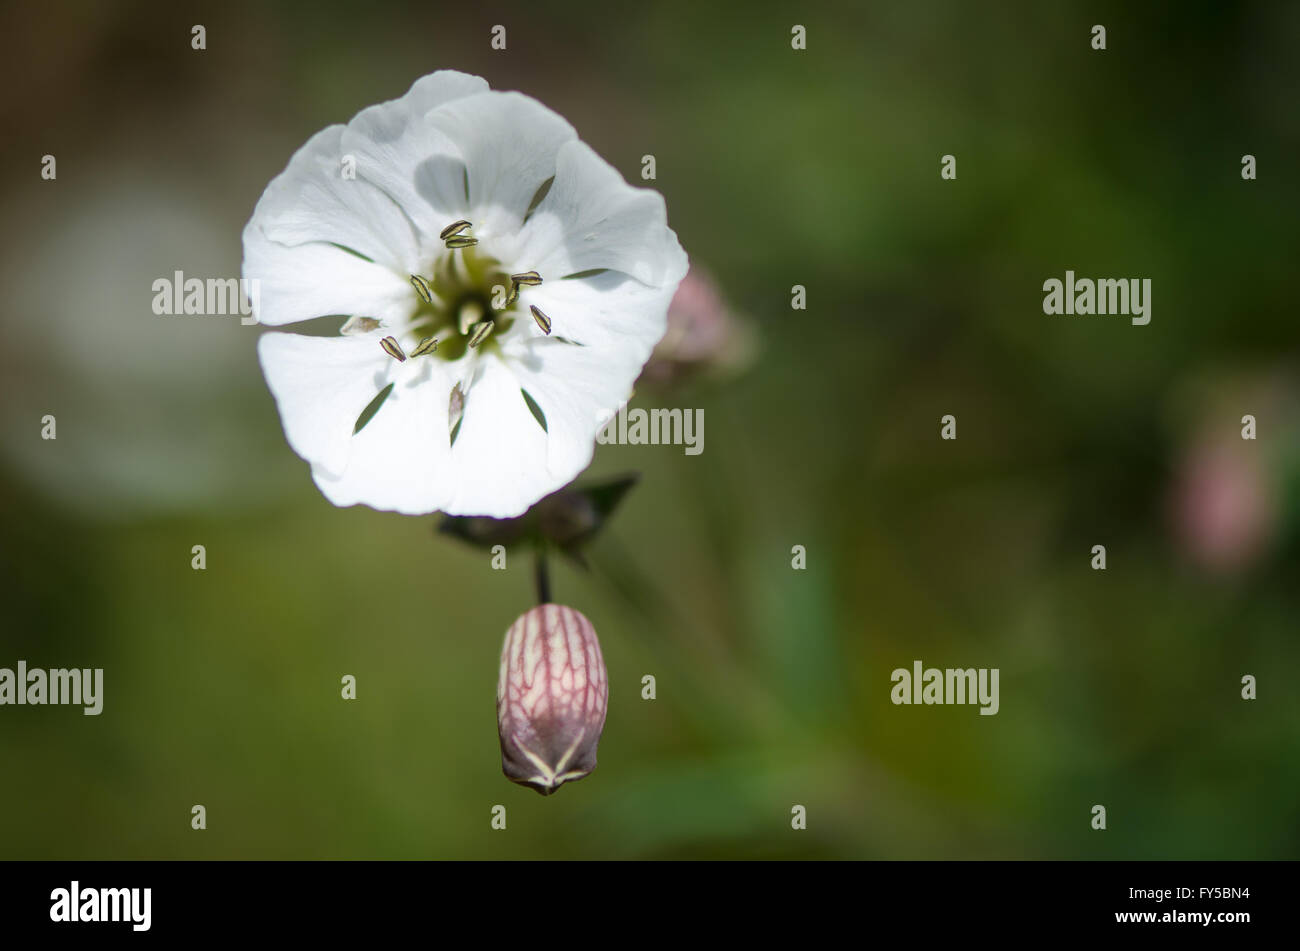 Sea campion (Silene vulgaris) flower and calyx tube, on plant in family Caryophyllaceae, common on European coasts Stock Photo